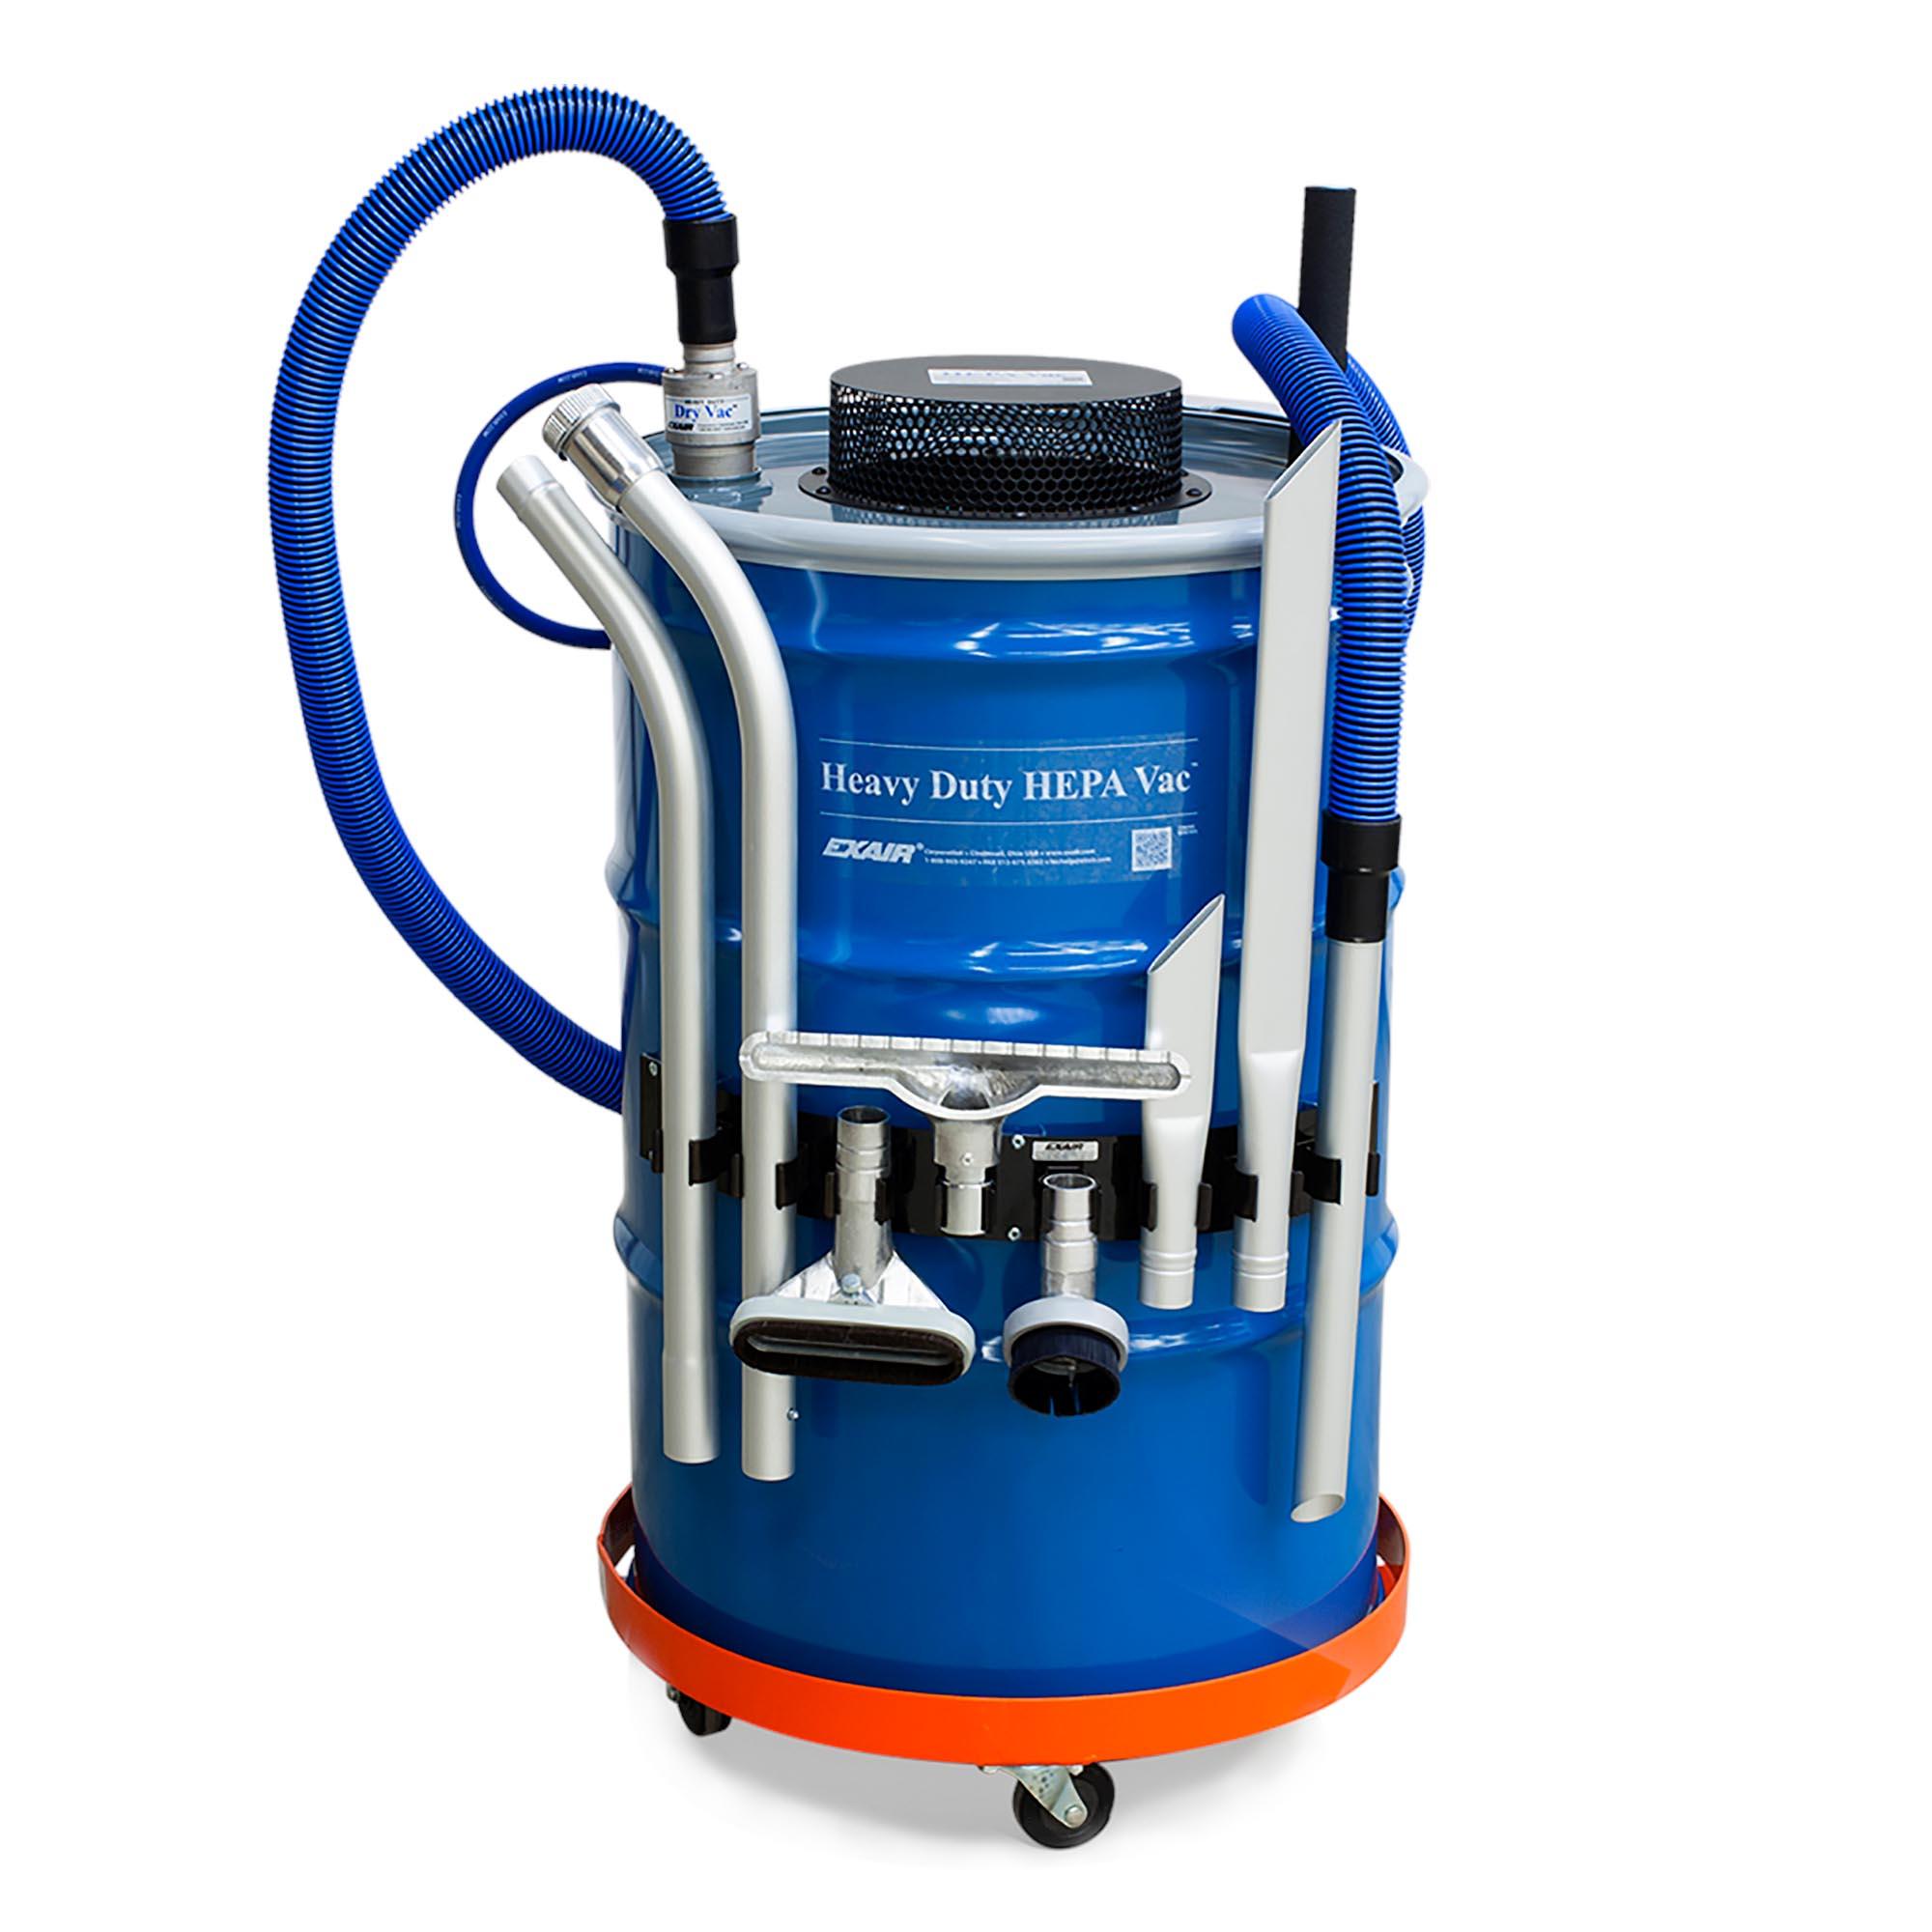 Model 6399 55 Gallon Premium Heavy Duty HEPA Vac System